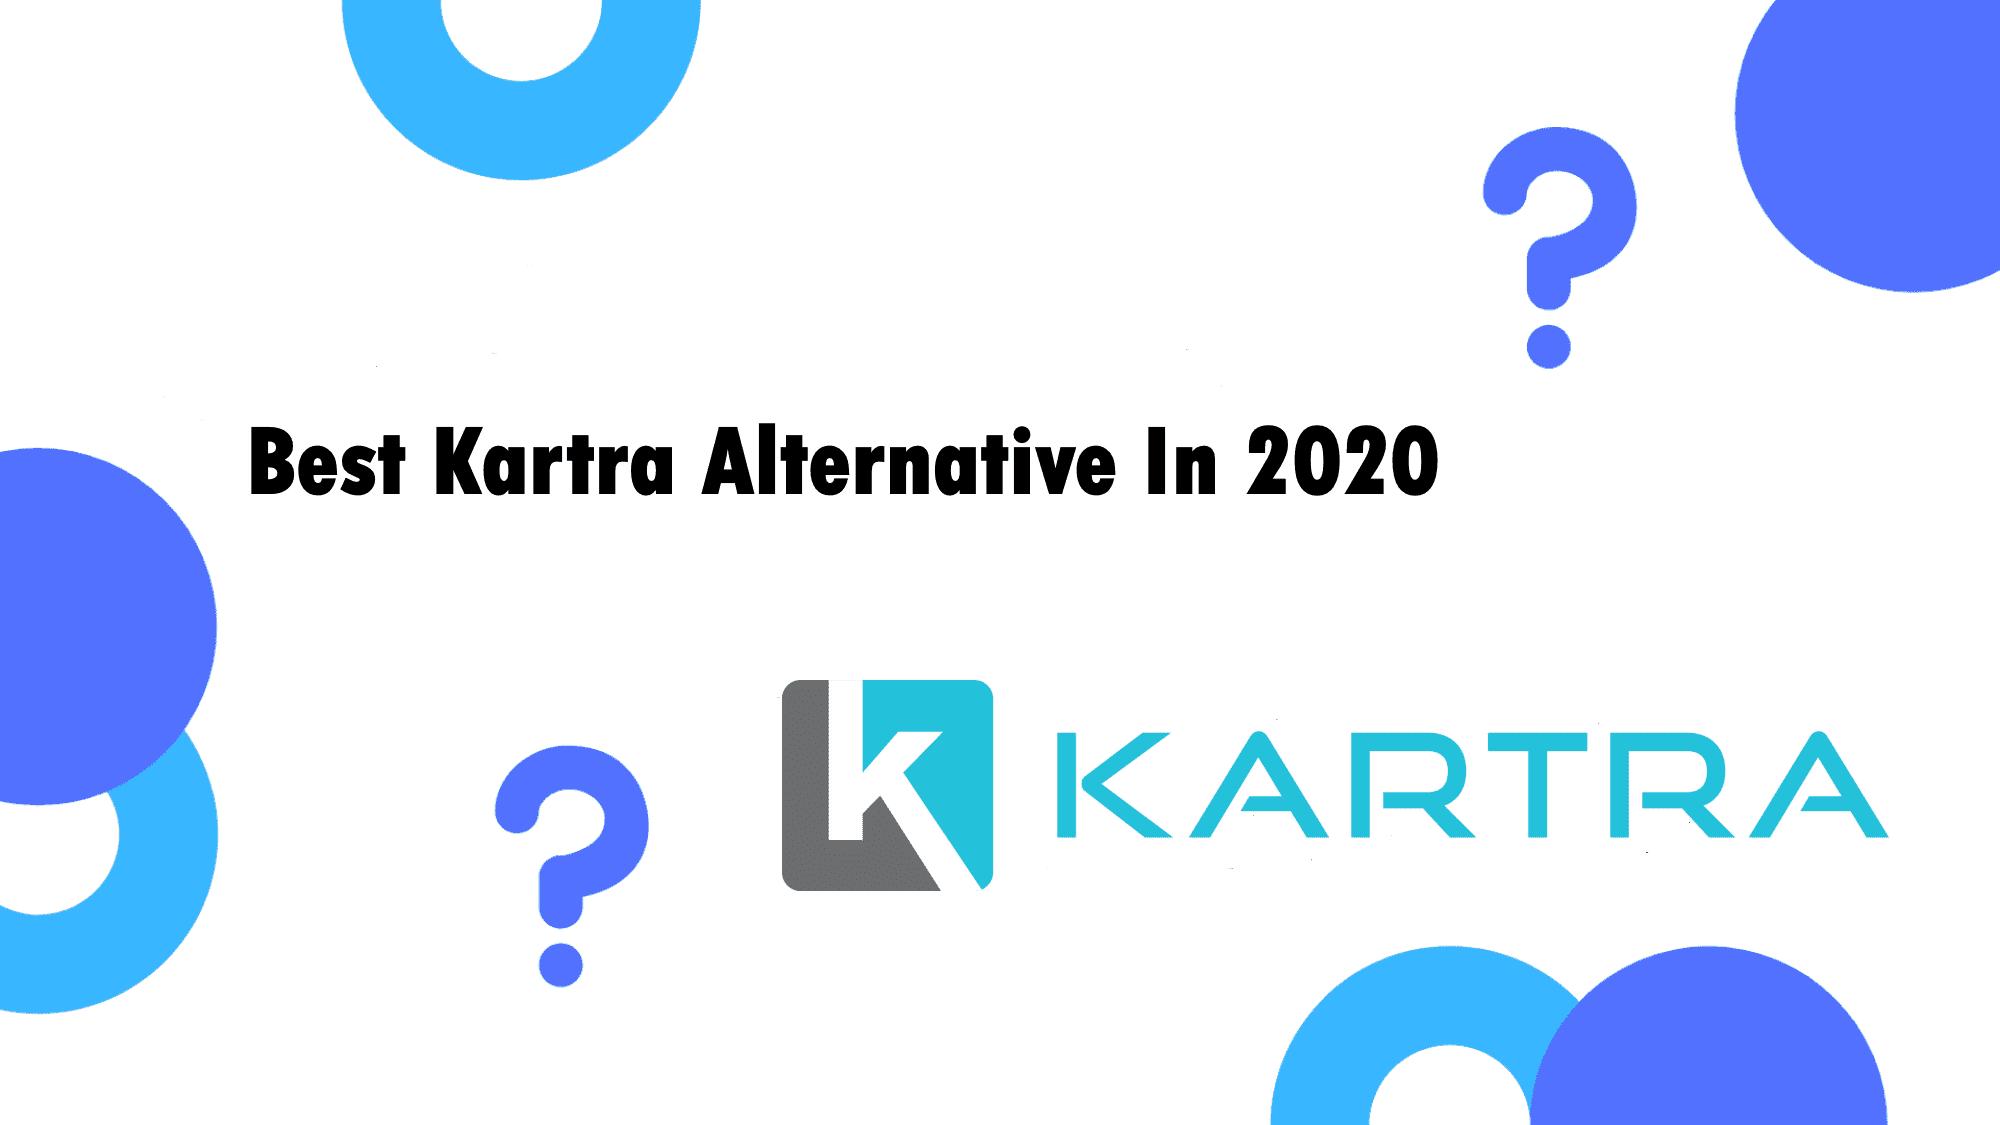 Best Kartra alternative